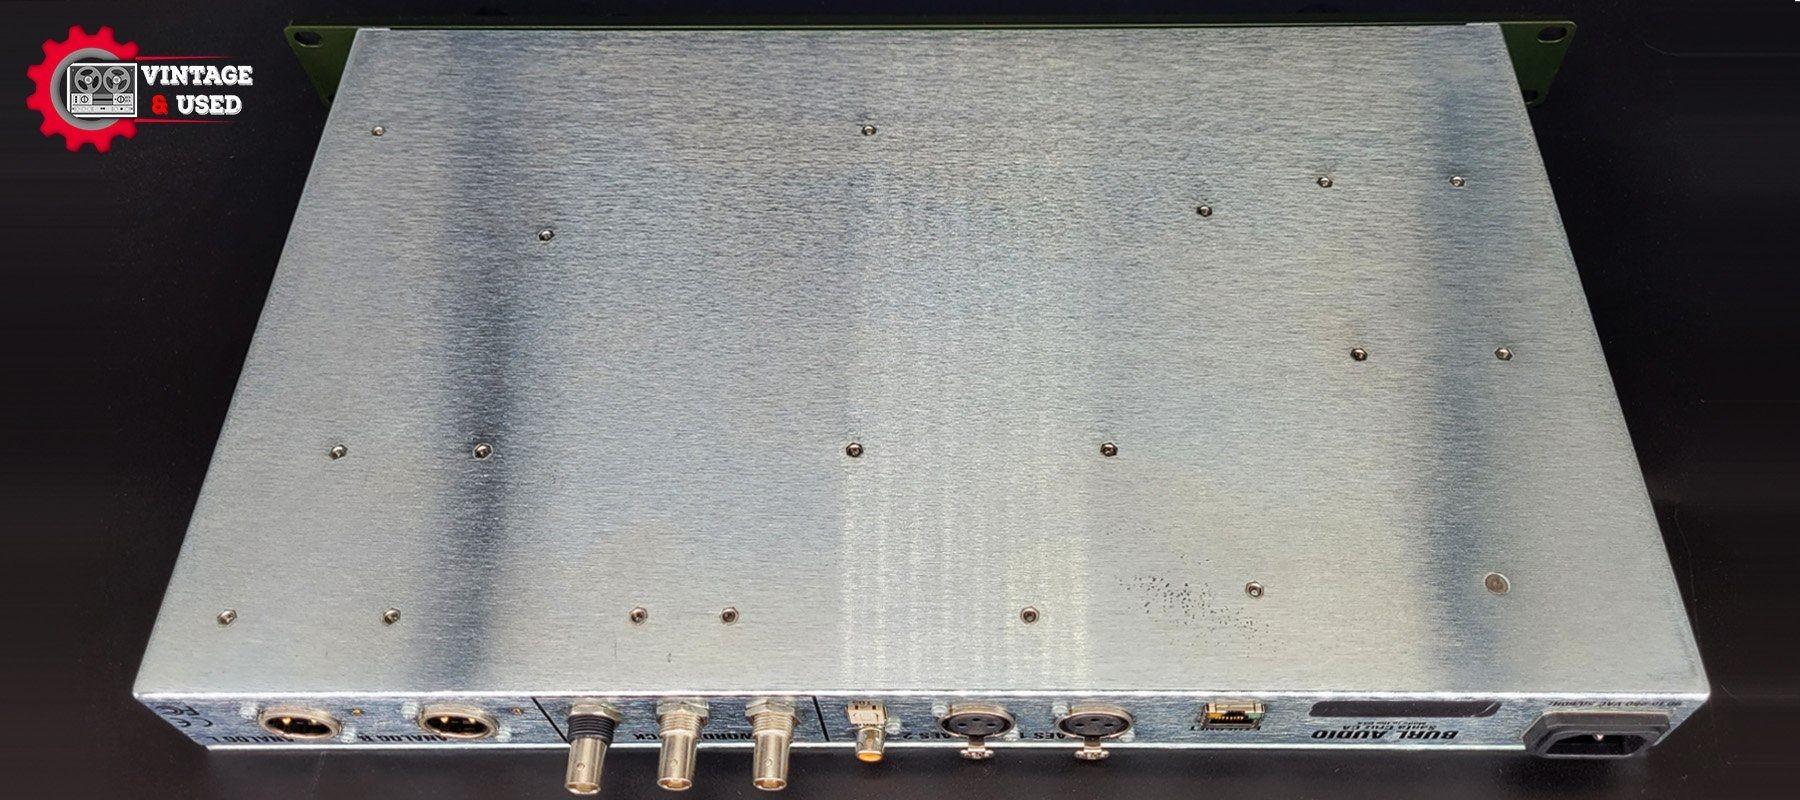 Burl Audio B2 Bomber DAC - Below